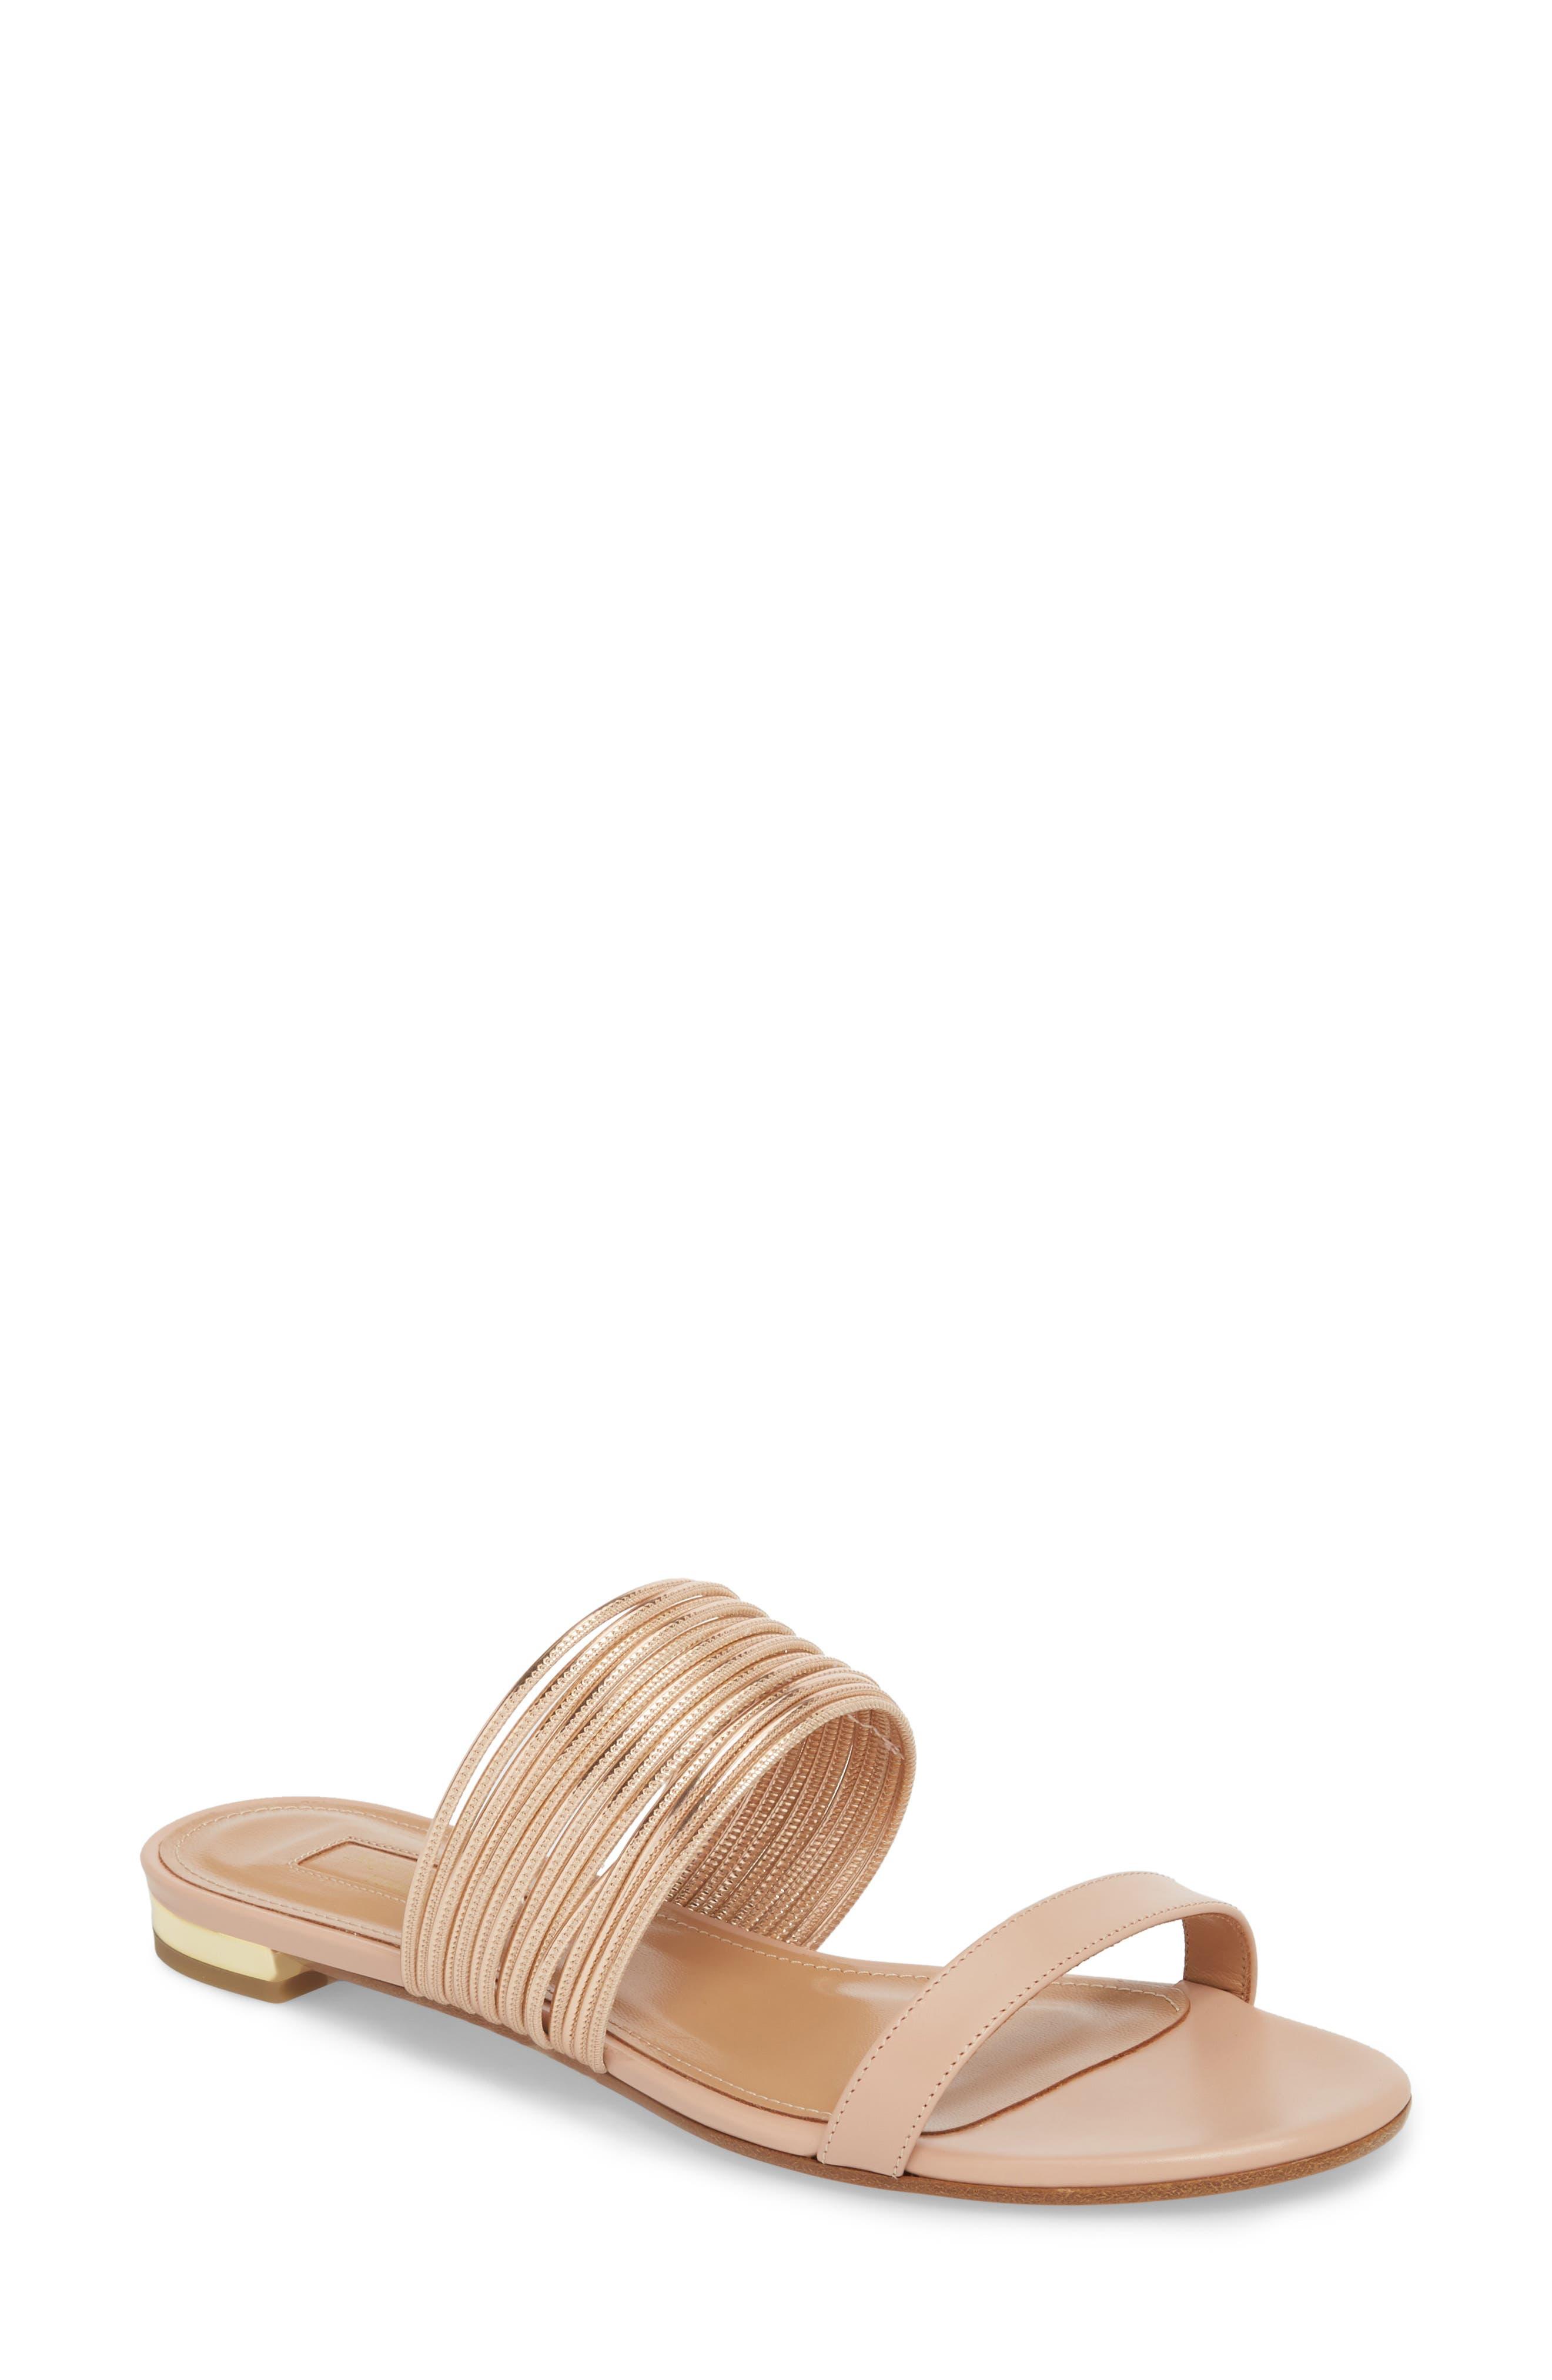 Rendezvous Metallic Sandal,                             Main thumbnail 1, color,                             POWDER PINK/CIPRIA